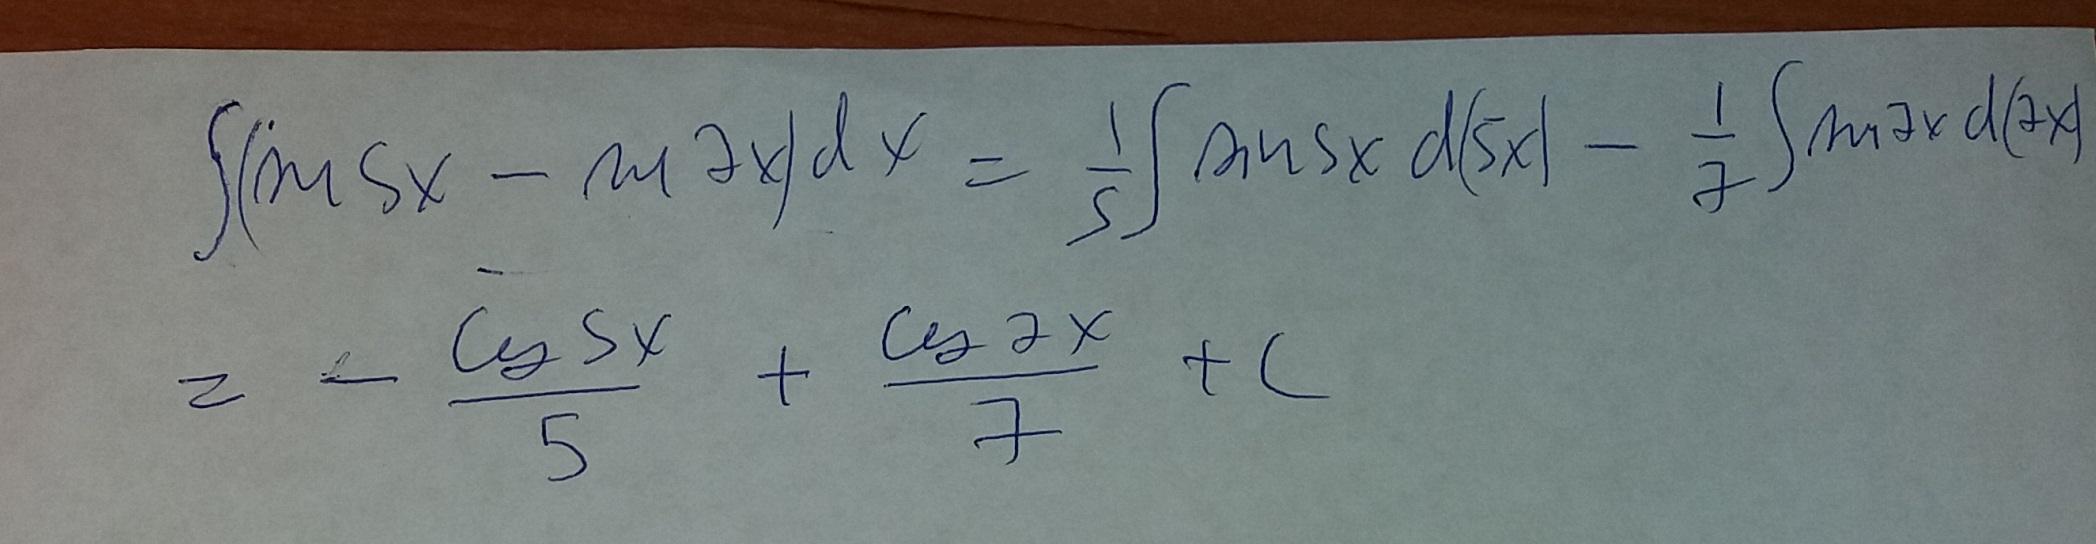 ∫sin5x-sin7xdx дам много баллов